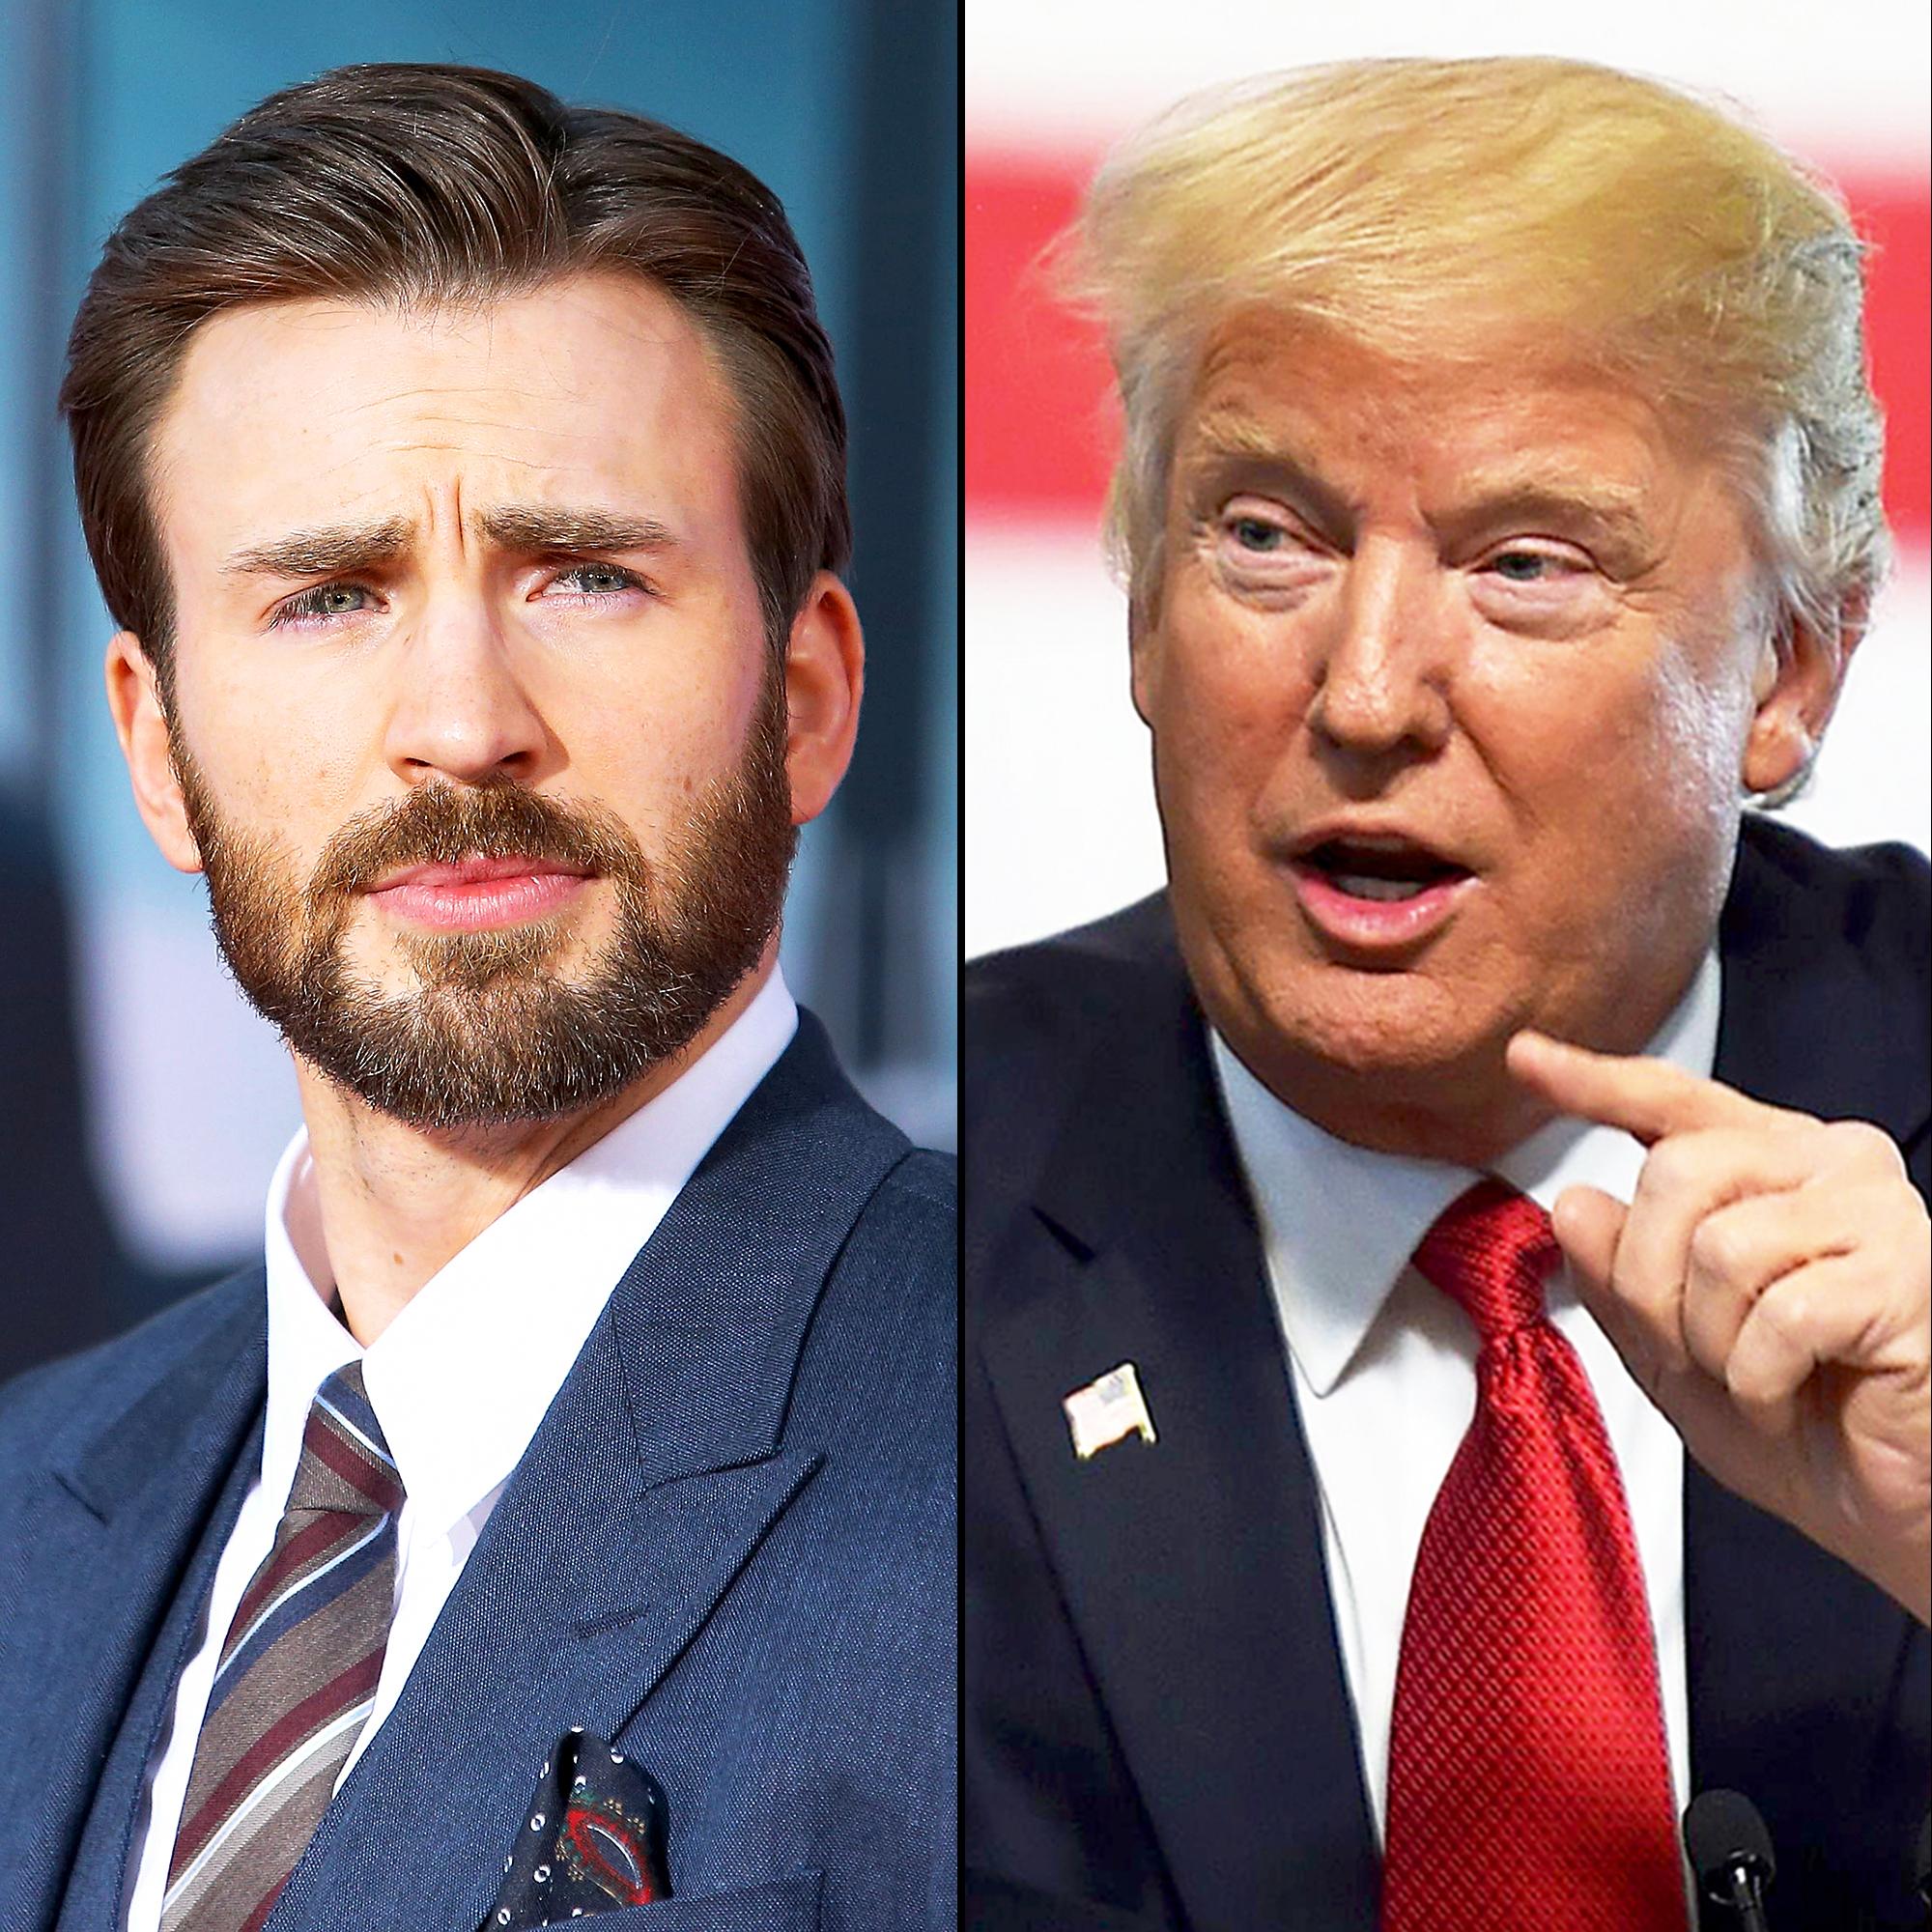 Chris Evans and Donald Trump